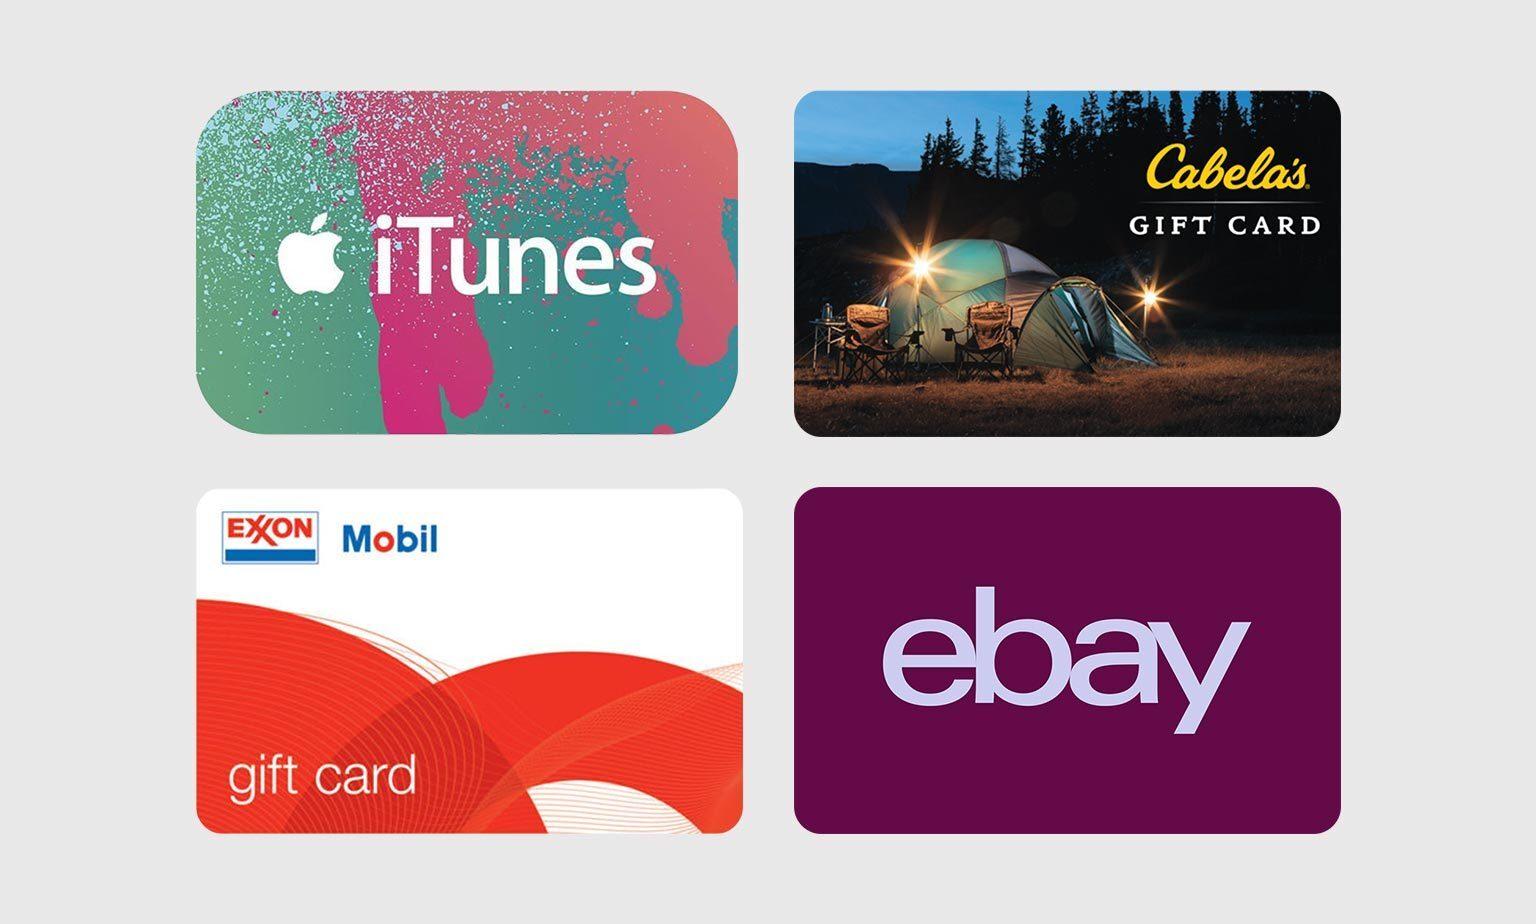 Restaurant & Dining Gift Cards | eBay